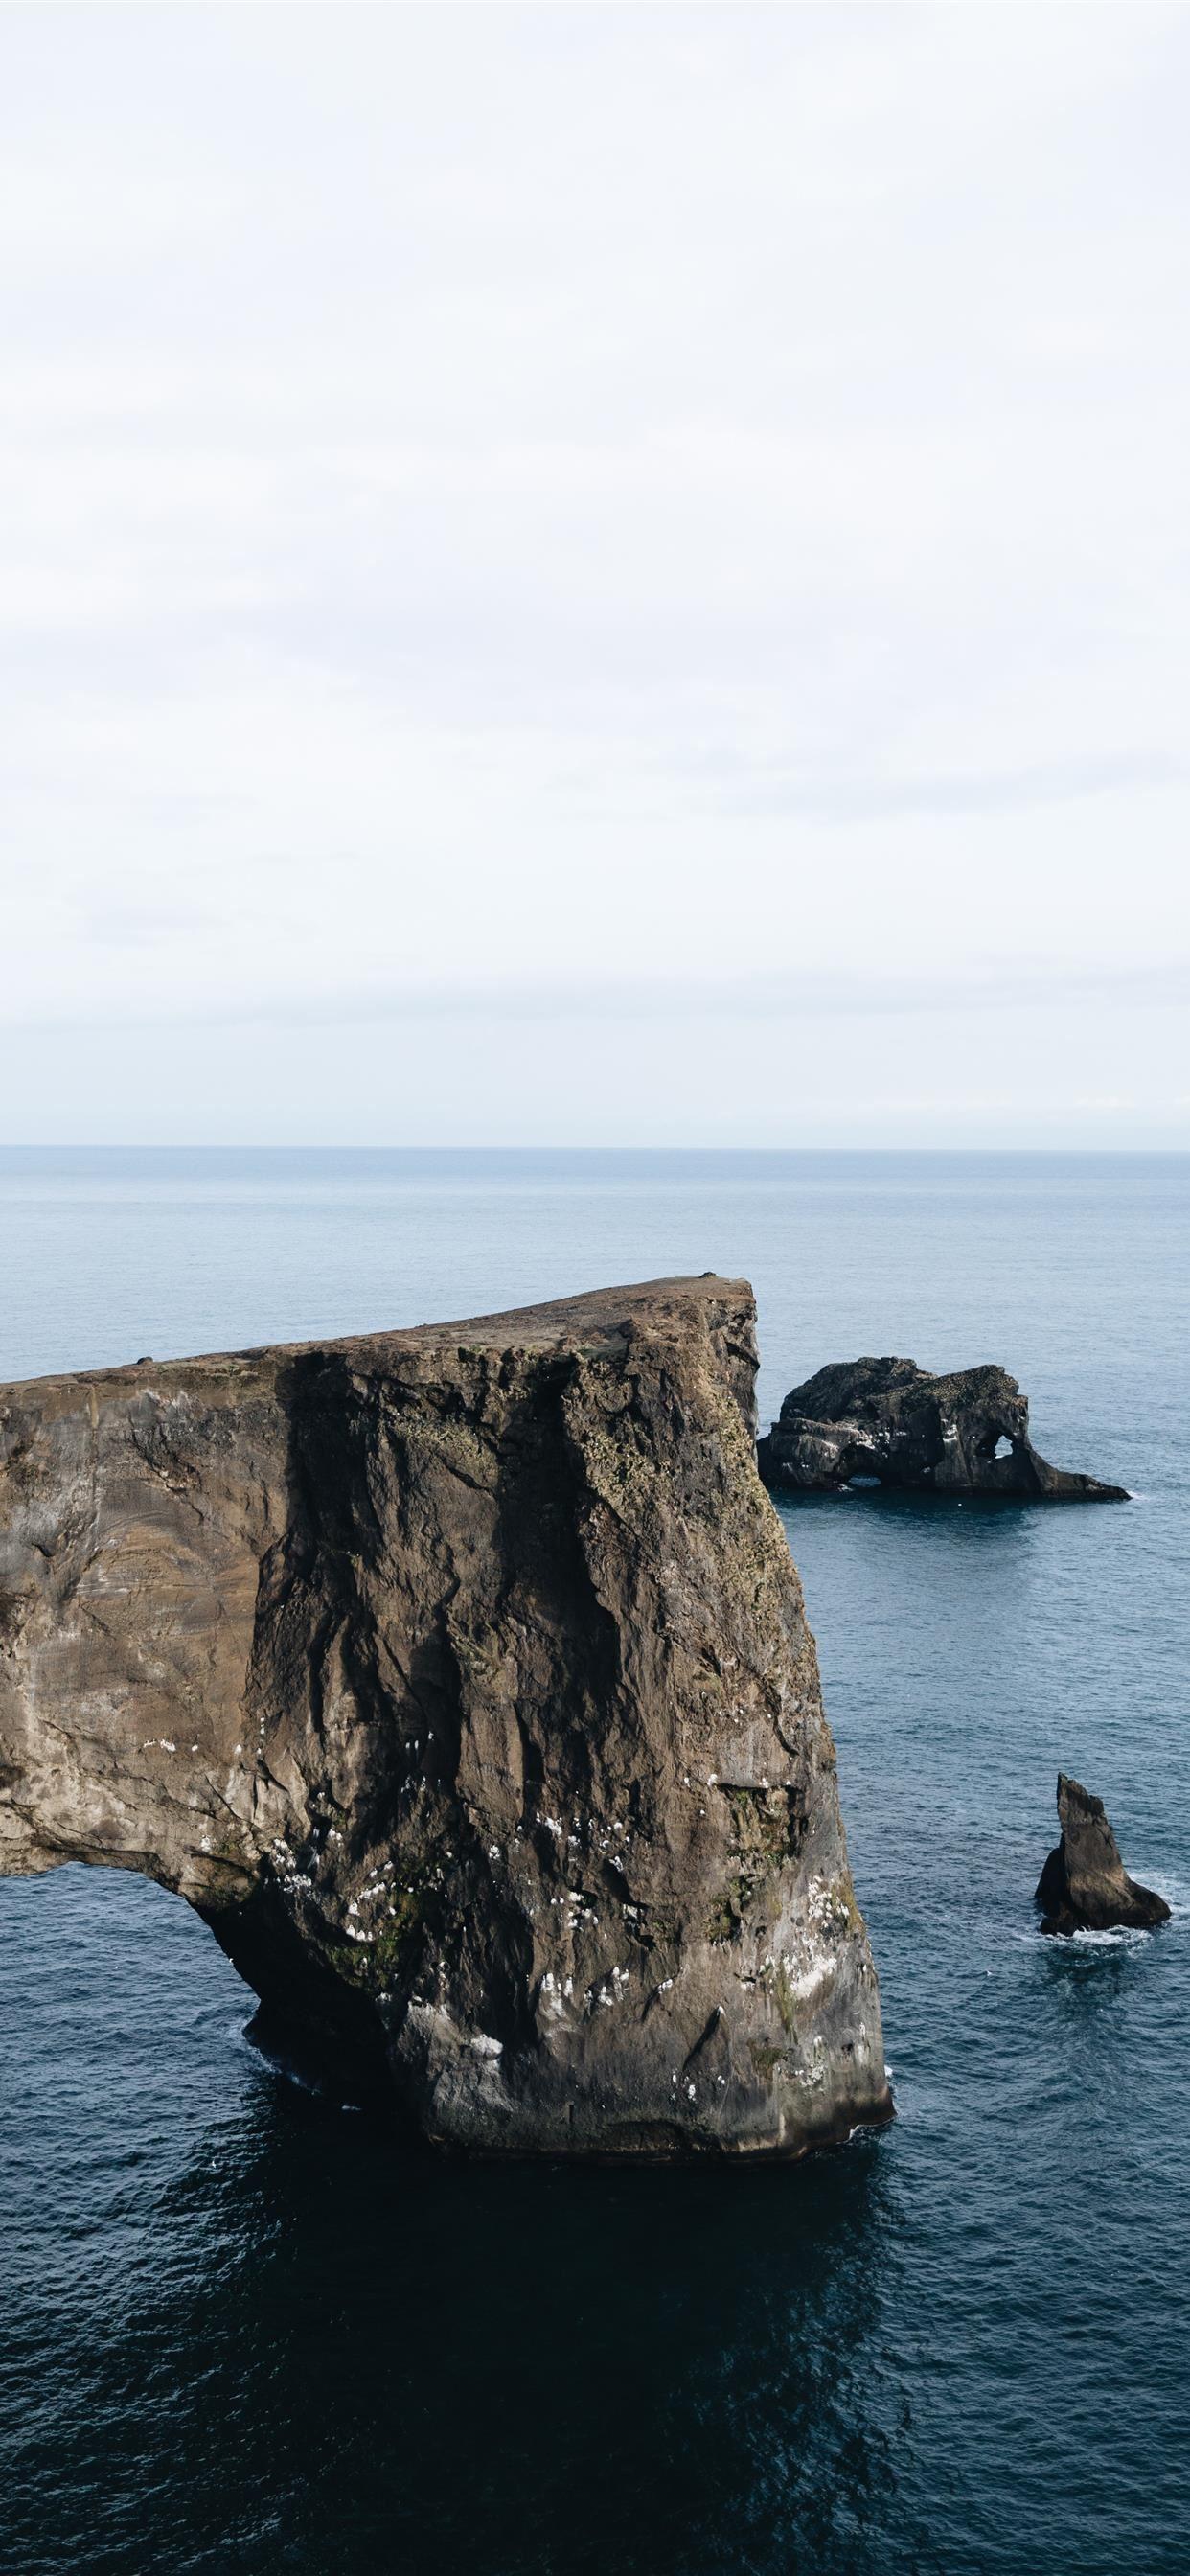 Icelandic overlook near Vik iPhone se wallpaper